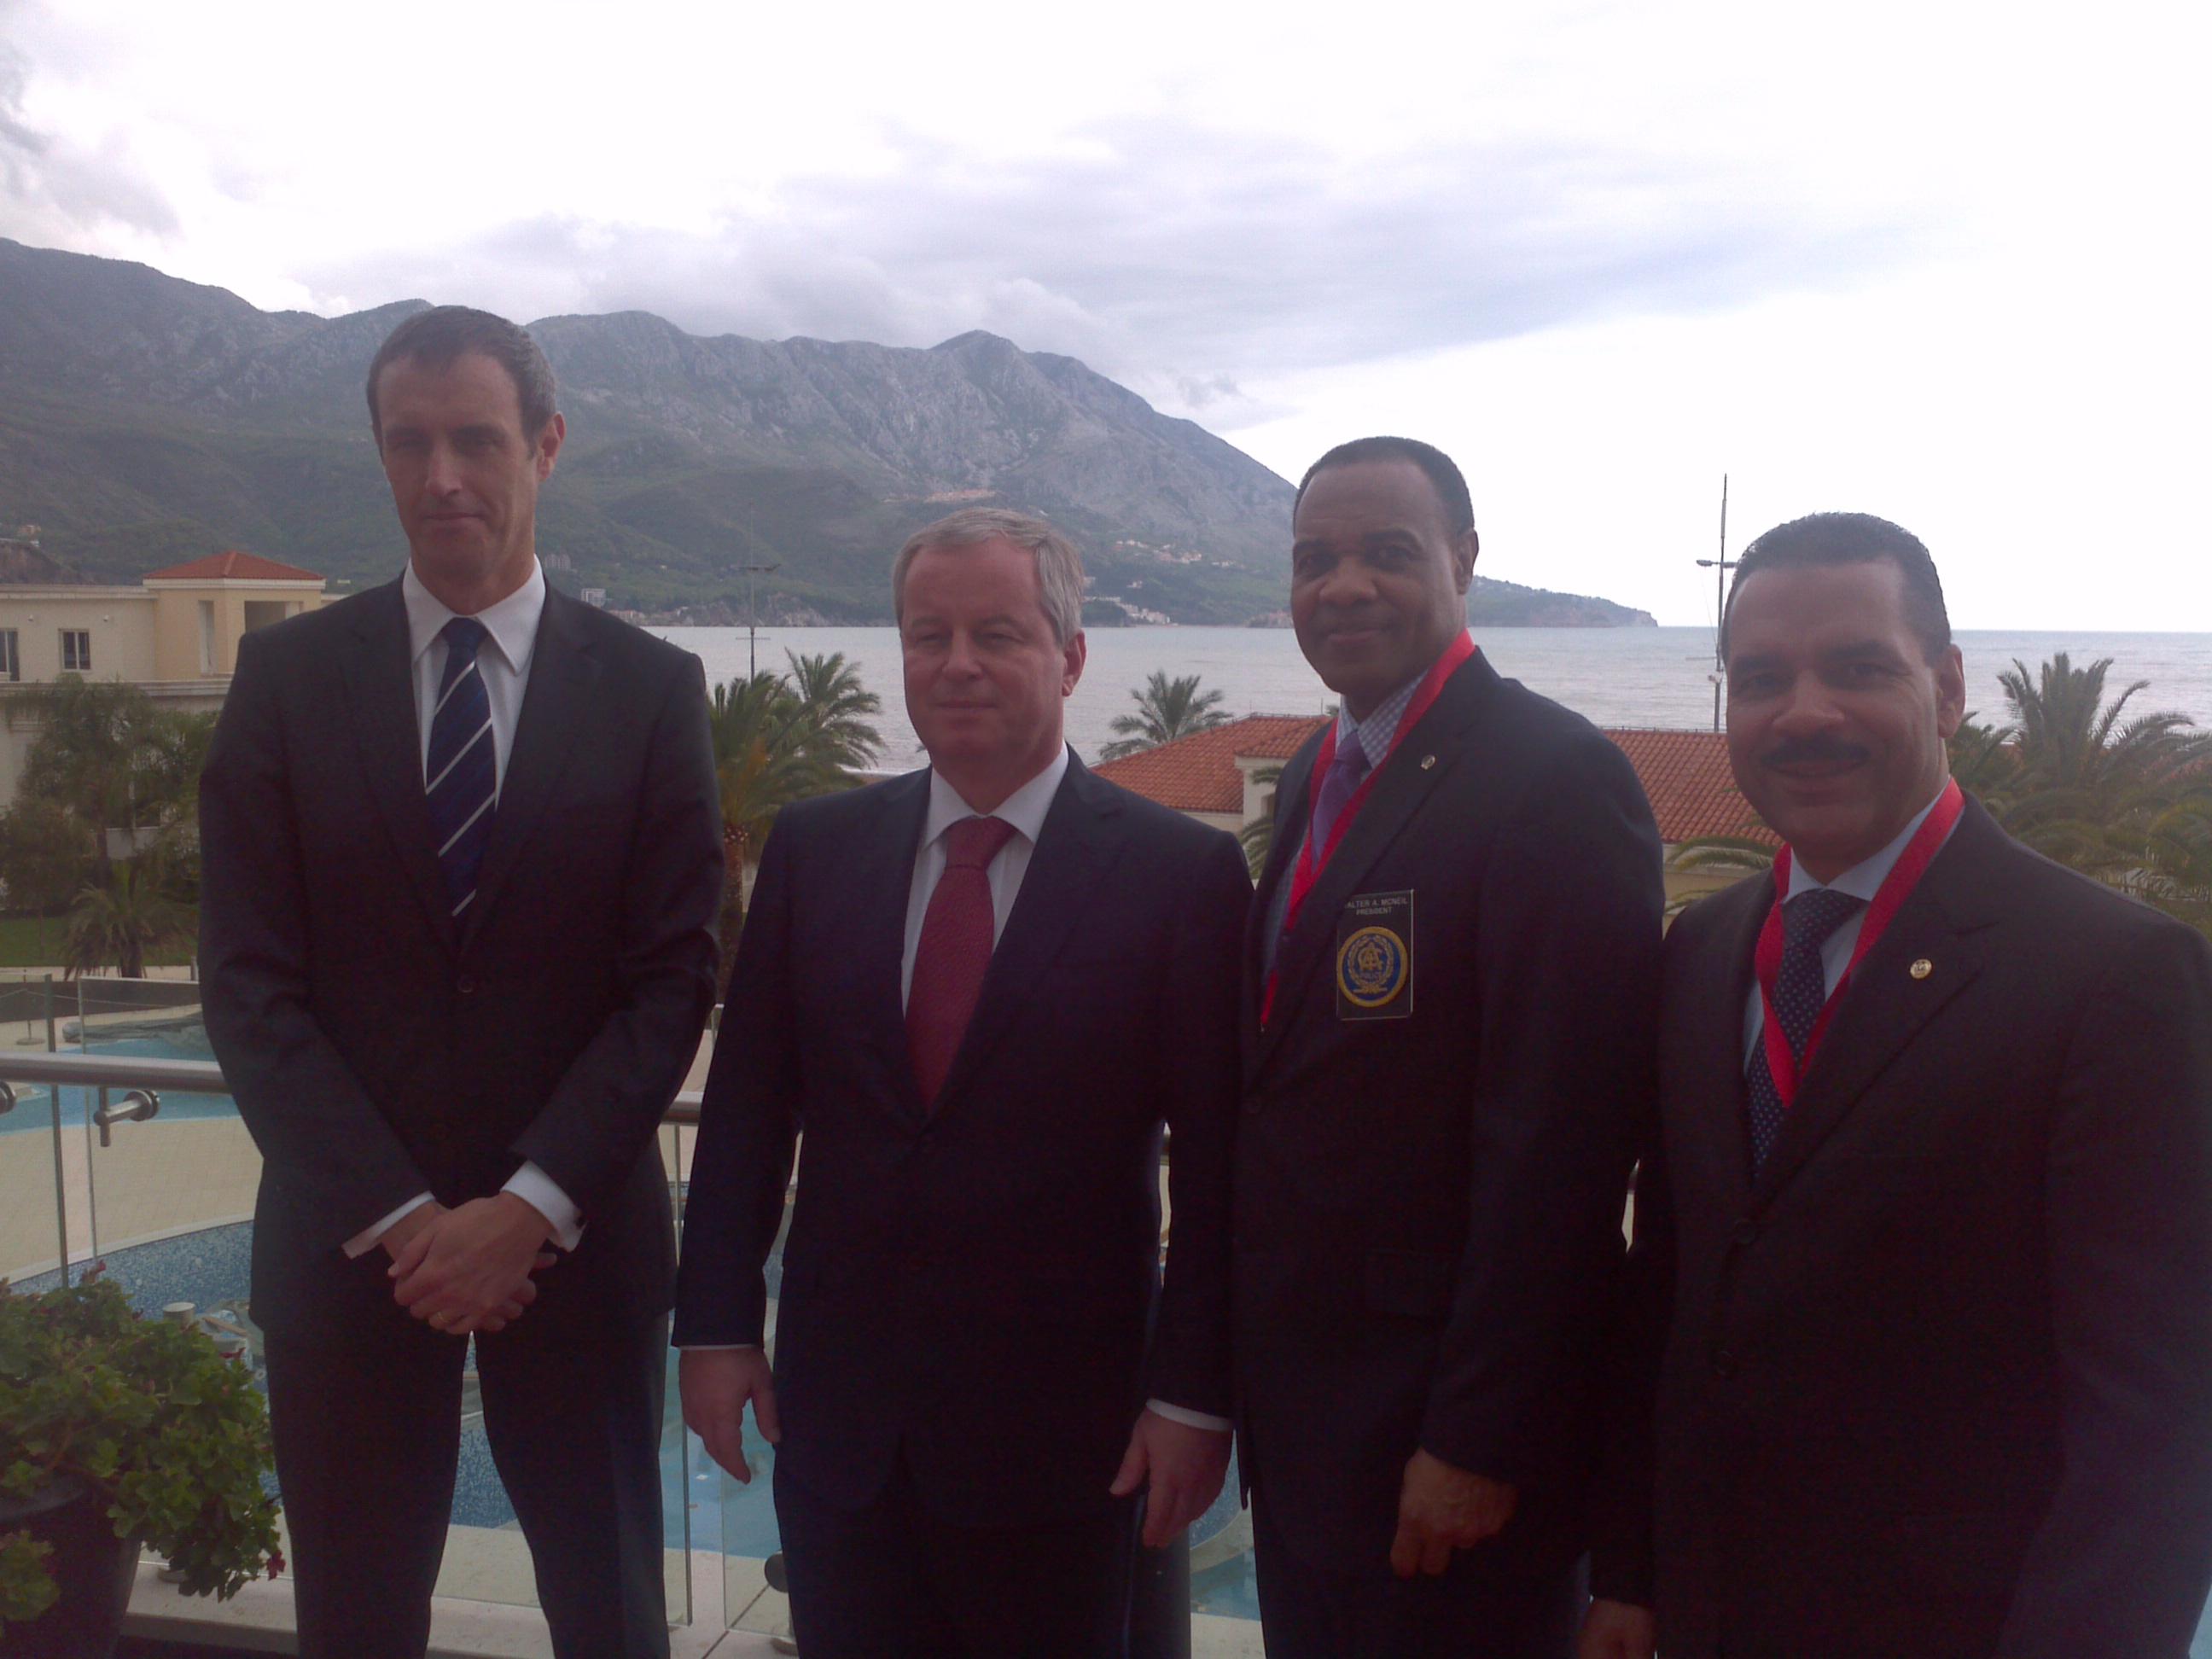 IACP Leadership in Montenegro